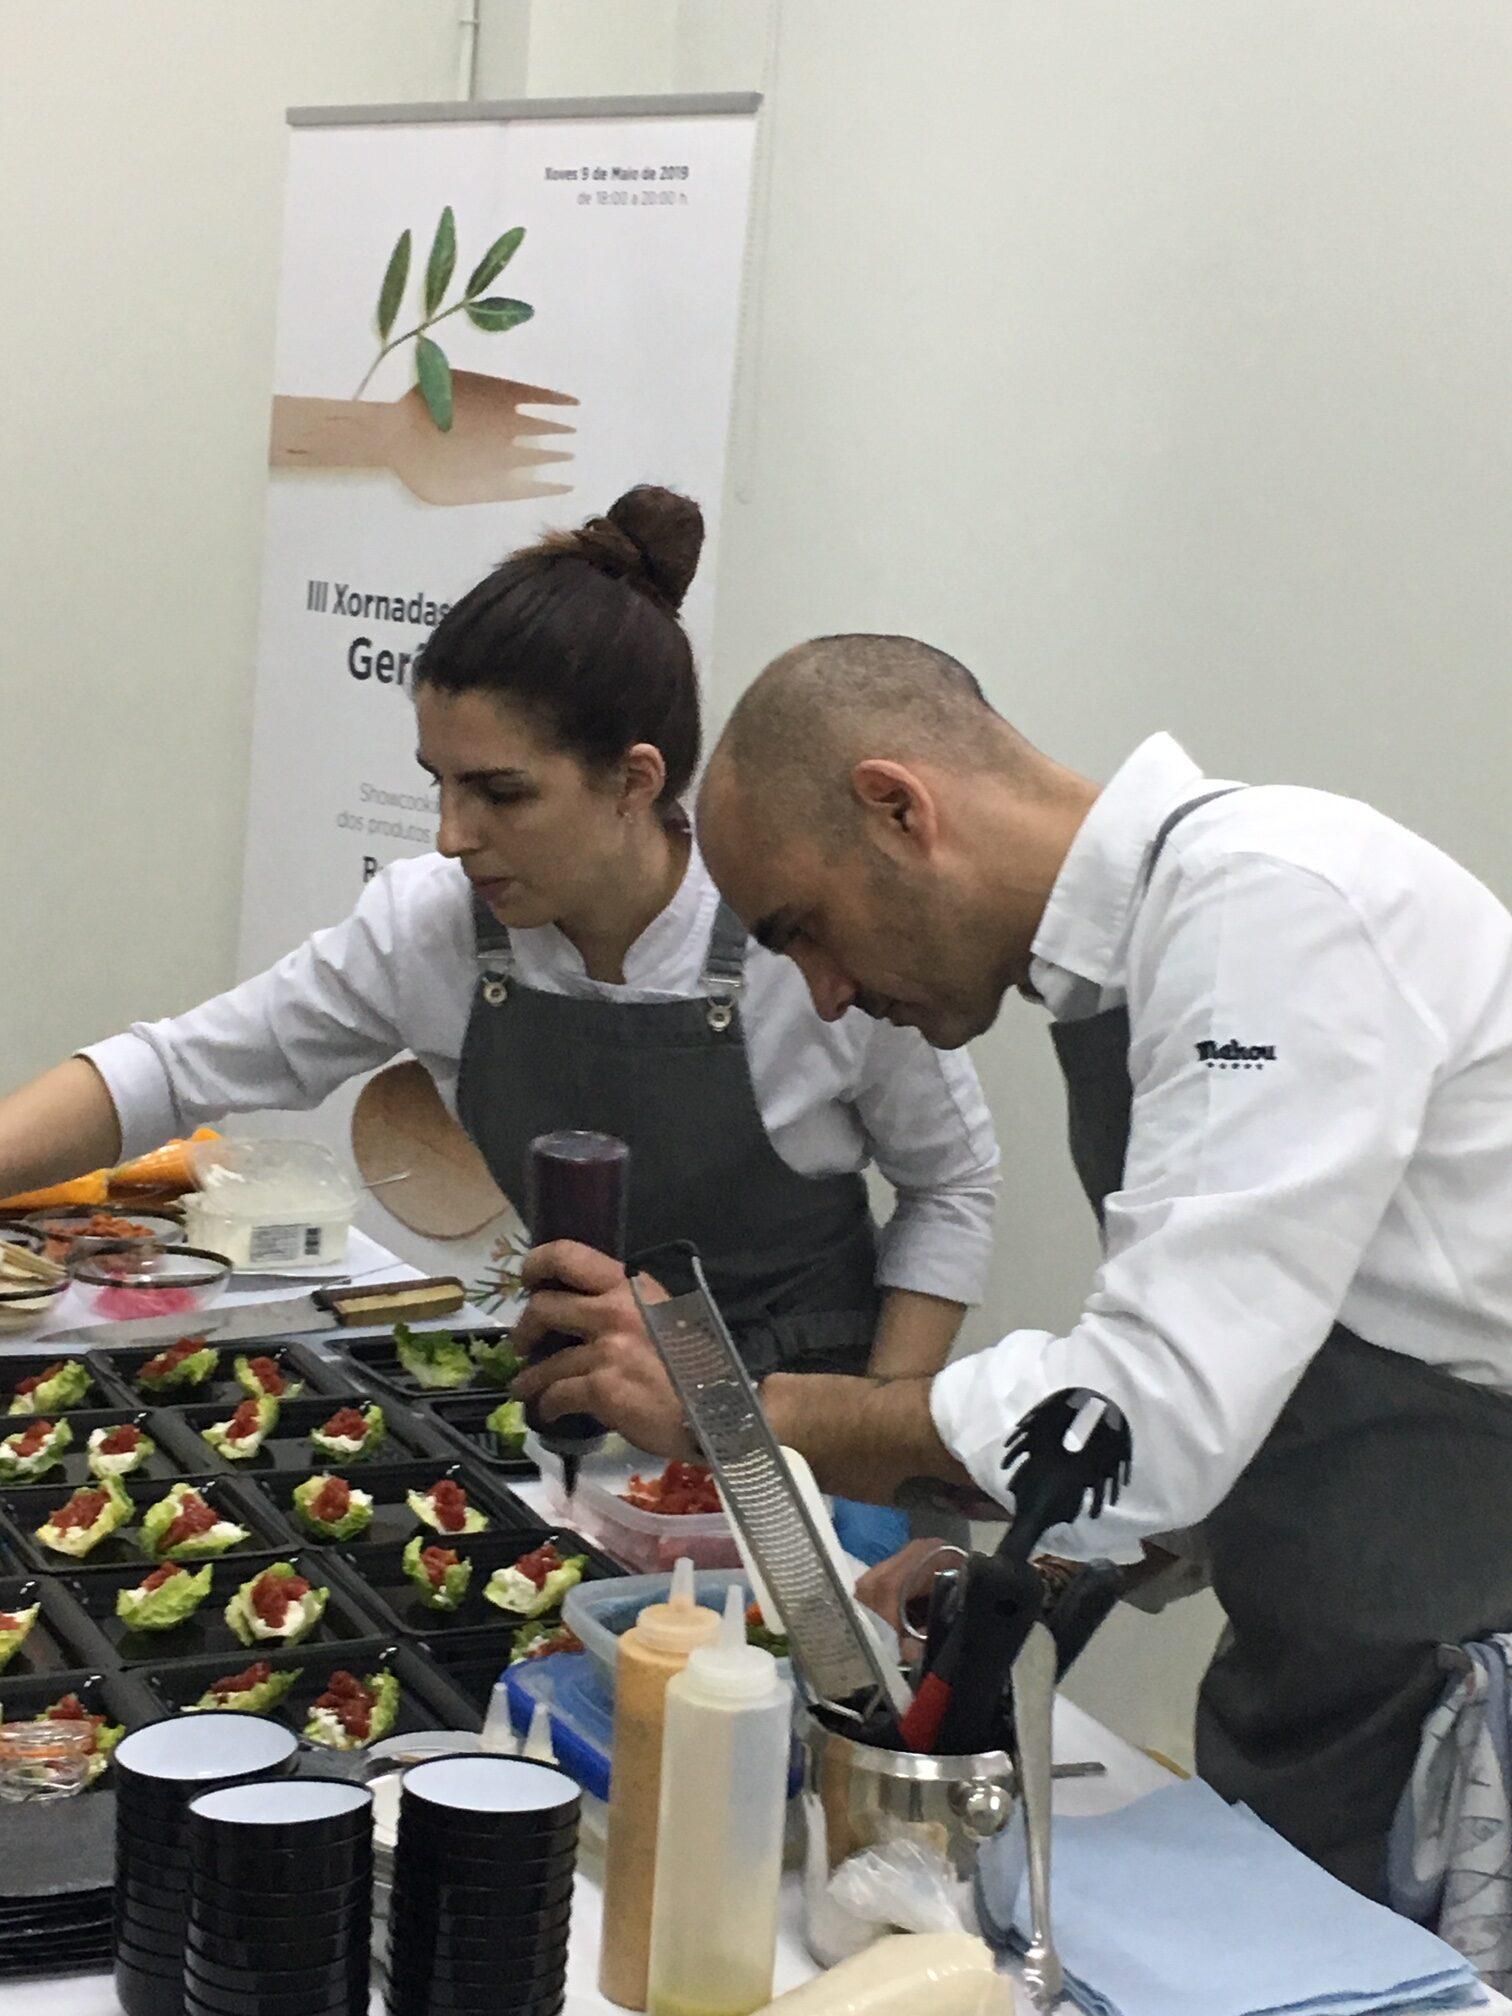 III Jornada Gastronómica del Gurés-Xerés con el chef Rafa Centeno